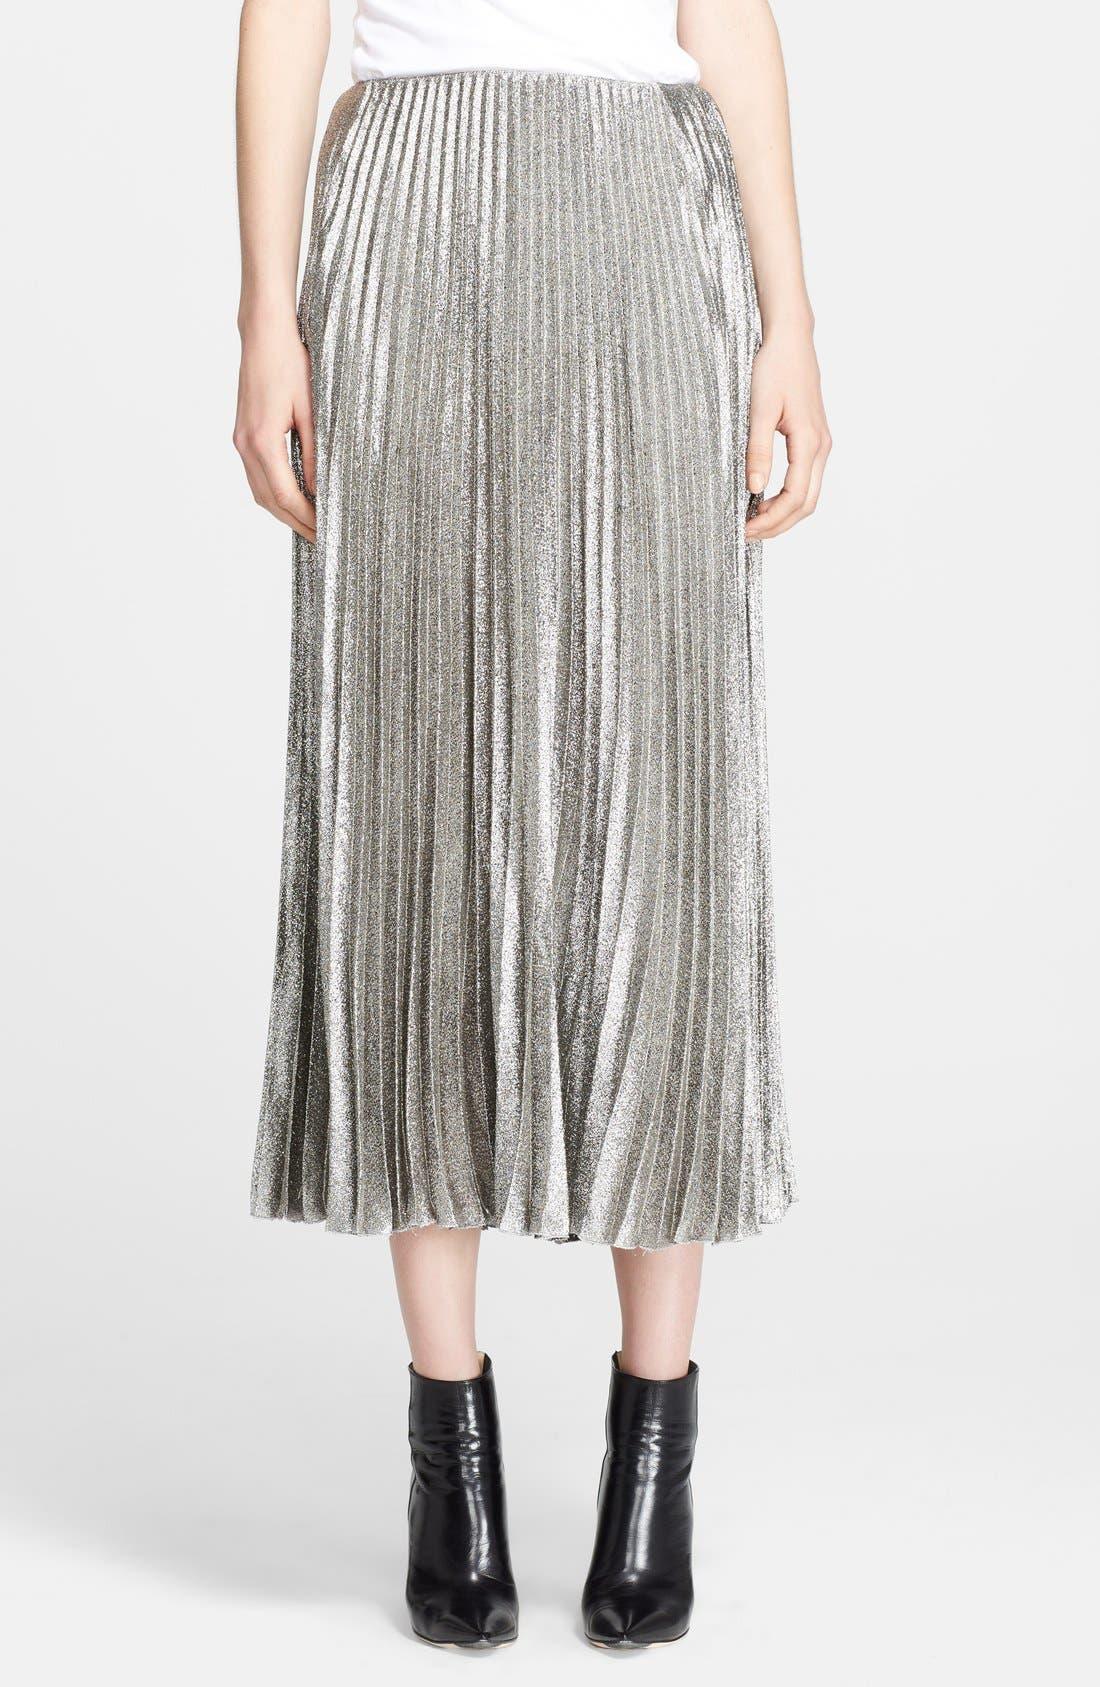 Alternate Image 1 Selected - Cédric Charlier Pleat Crepe Lamé Midi Skirt